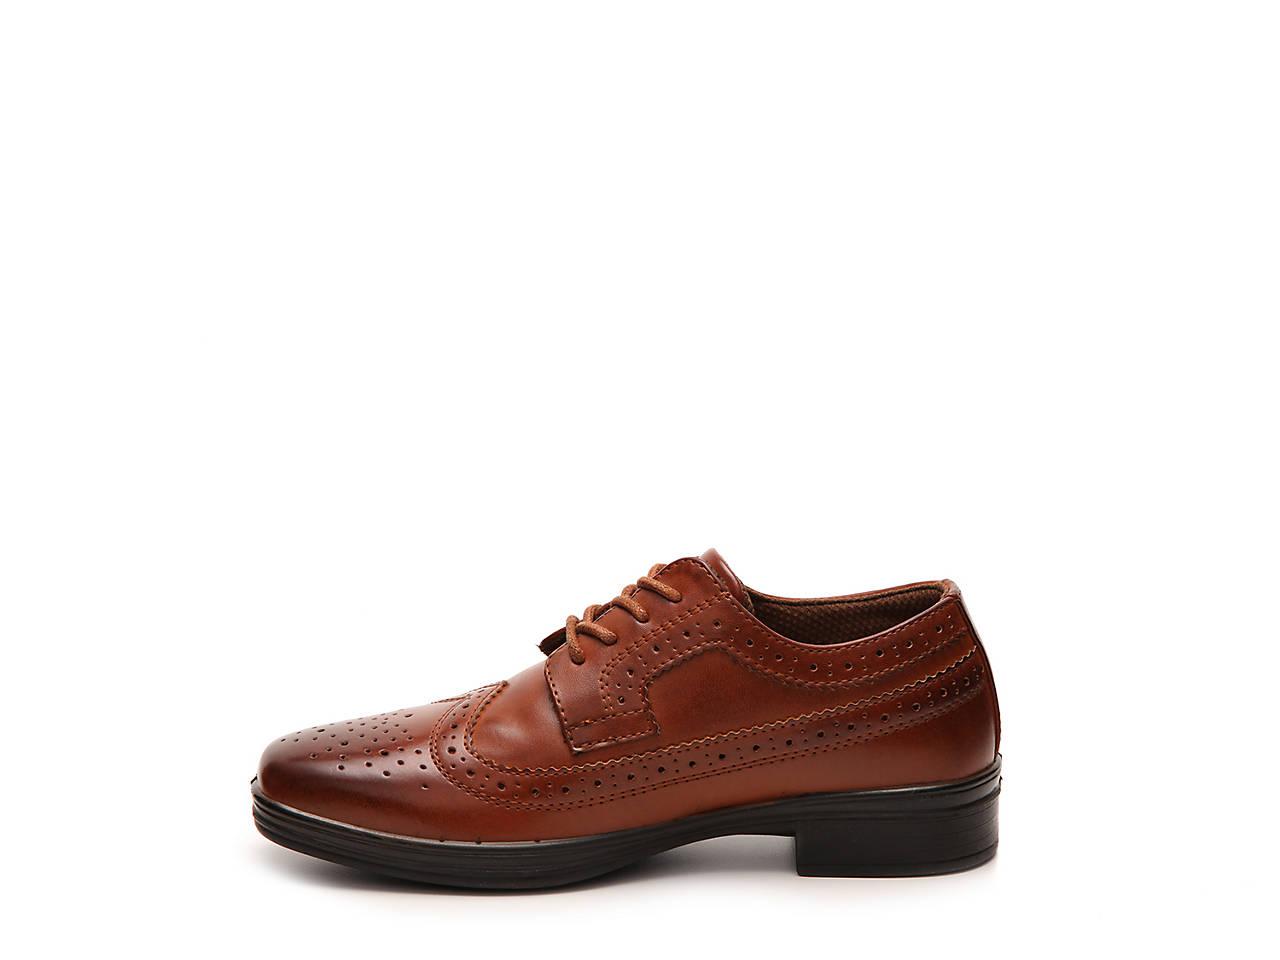 Joseph Allen Boys Wing Tip Oxford Dress Shoe Toddler, Little Kid, Big Kid